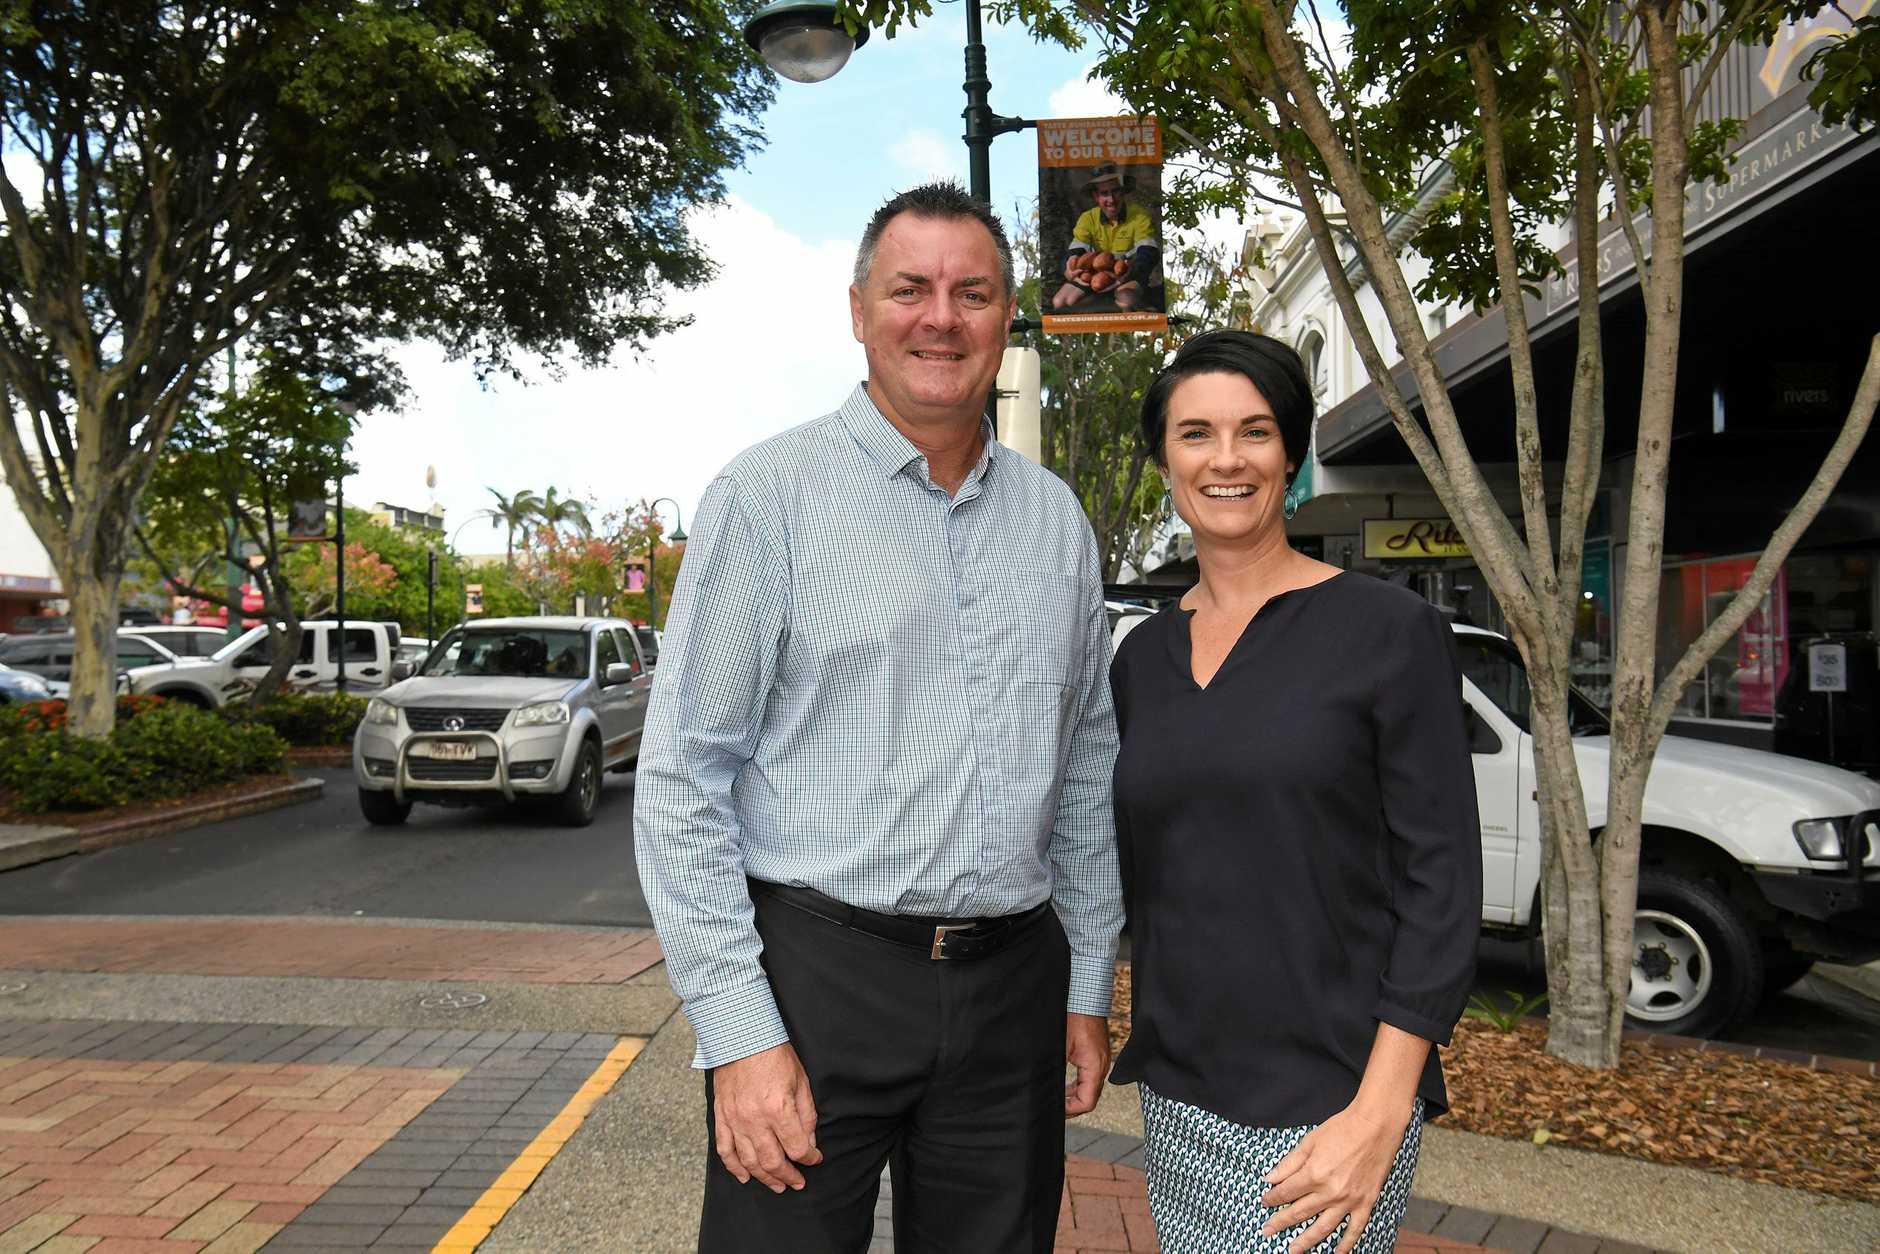 TASTE BUNDABERG: Bundaberg Chamber of Commerce president Yale Morgan with Tourism general manager Katherine Reid.